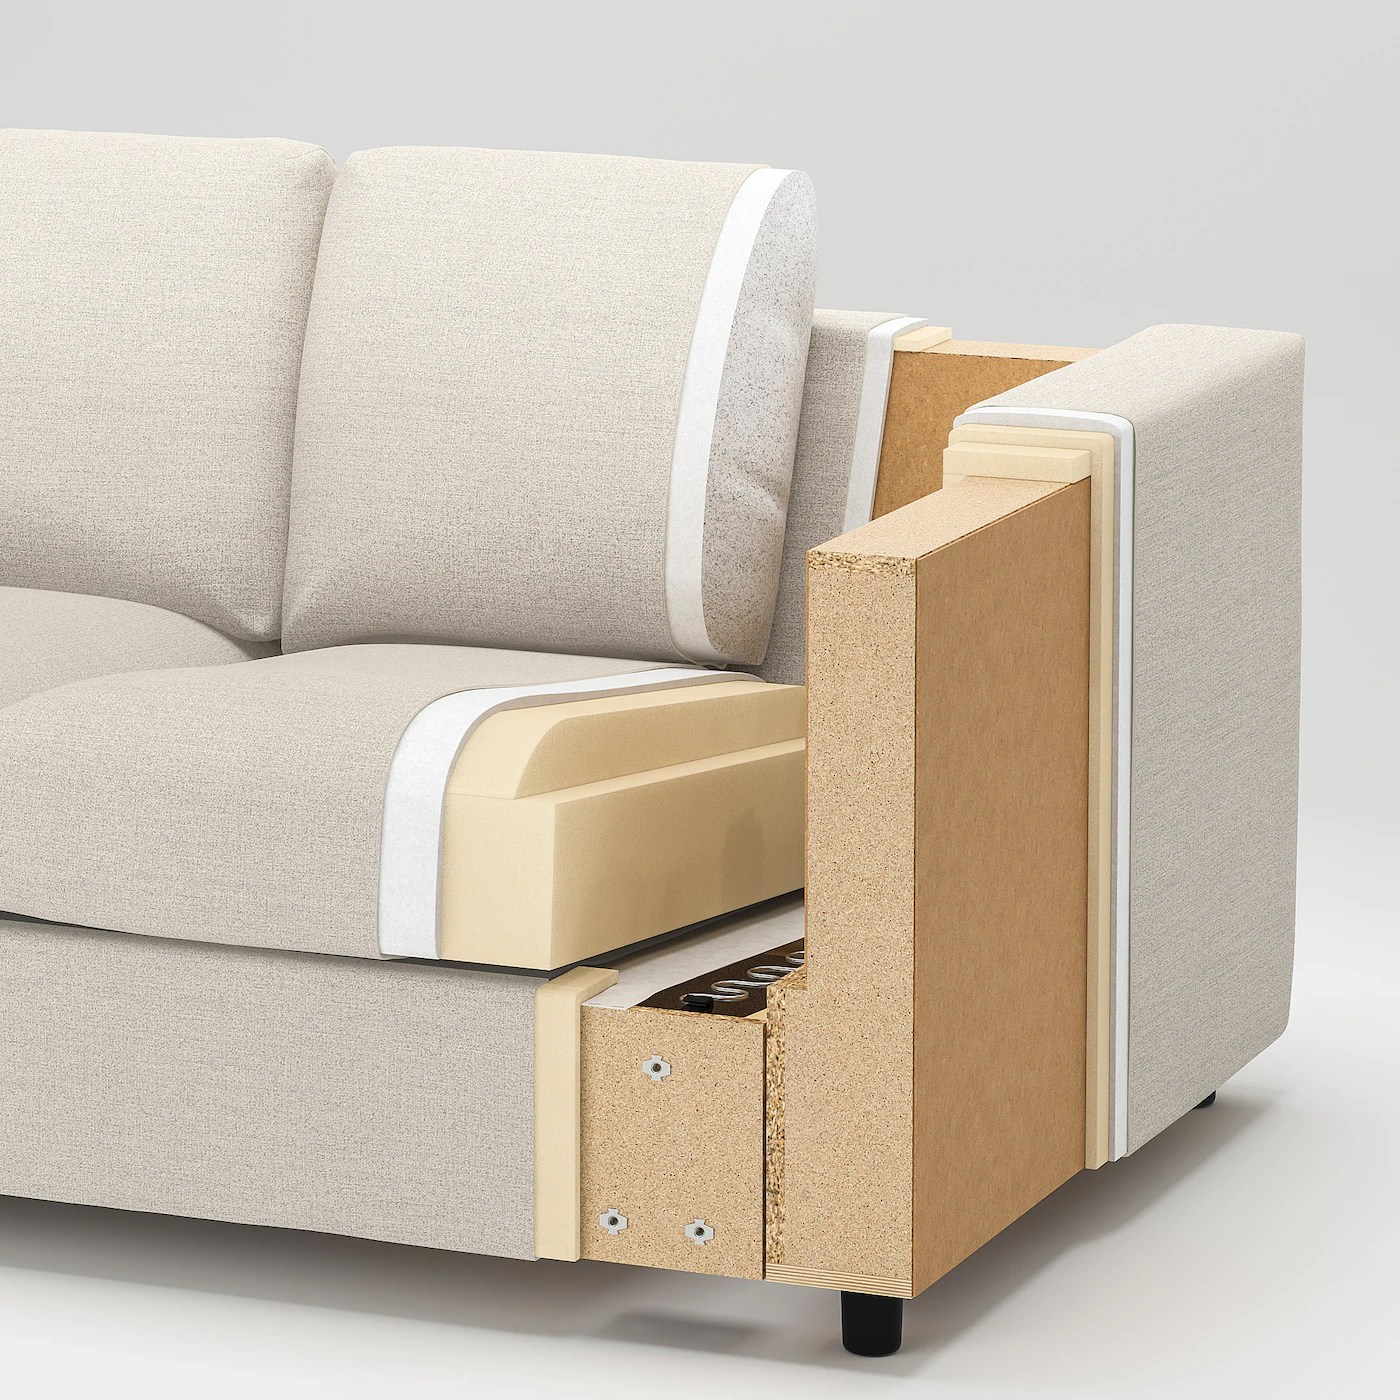 Vimle Convertible 2 Places Gunnared Gris Moyen Ikea